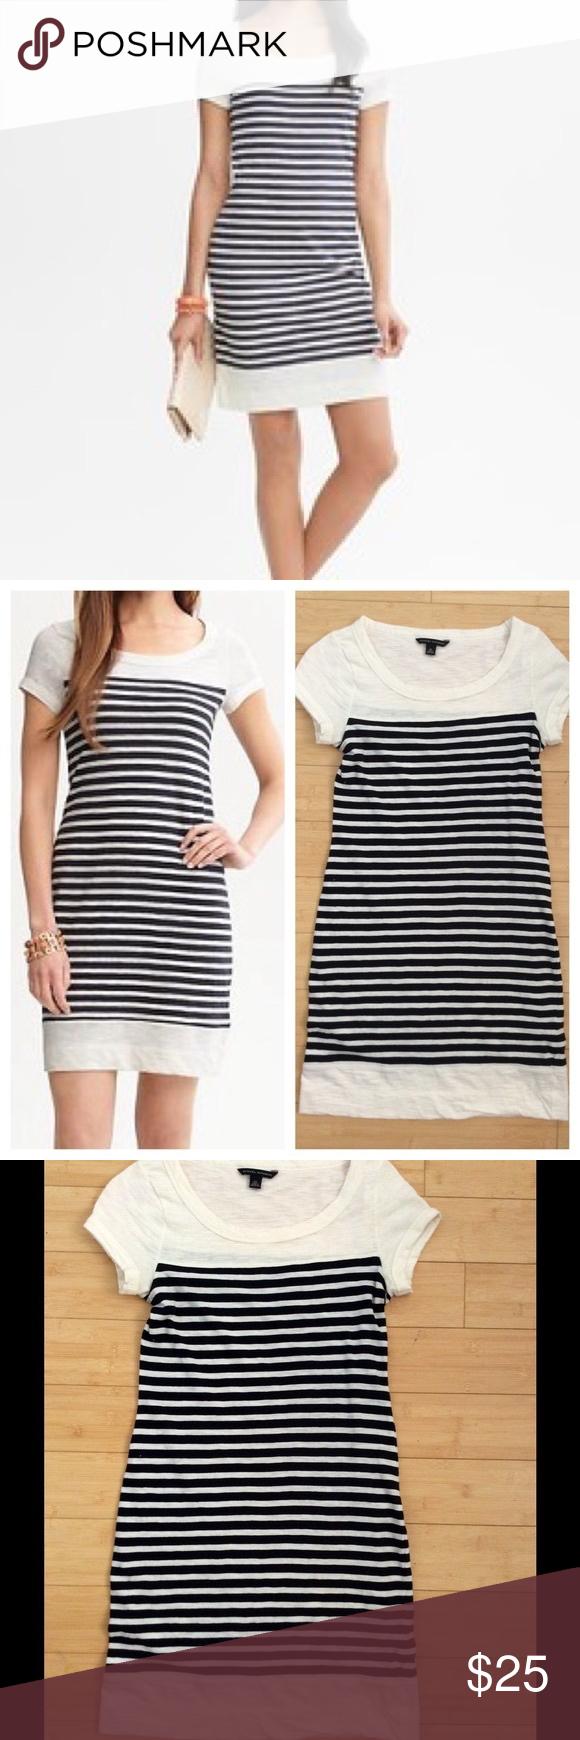 9afff4a5d Banana Republic Striped Tee Shirt Dress Super cute and very comfortable tee  shirt dress. Add